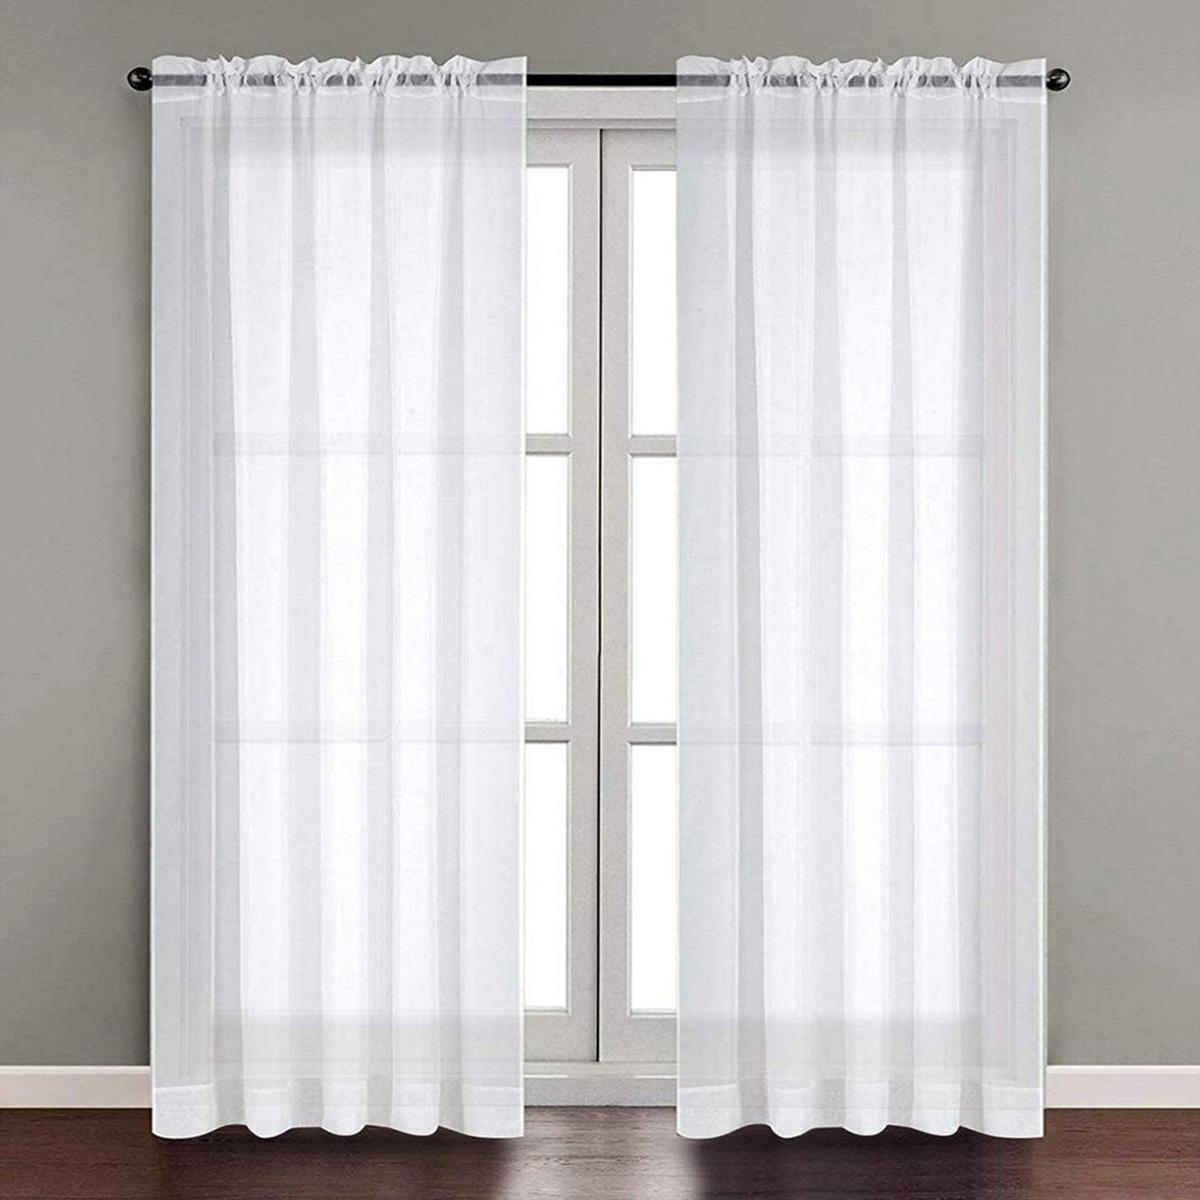 Curtains 2 Panels White Sheer W54 X L84 Sheer Voile White Luxurious High Thread Window Curtains